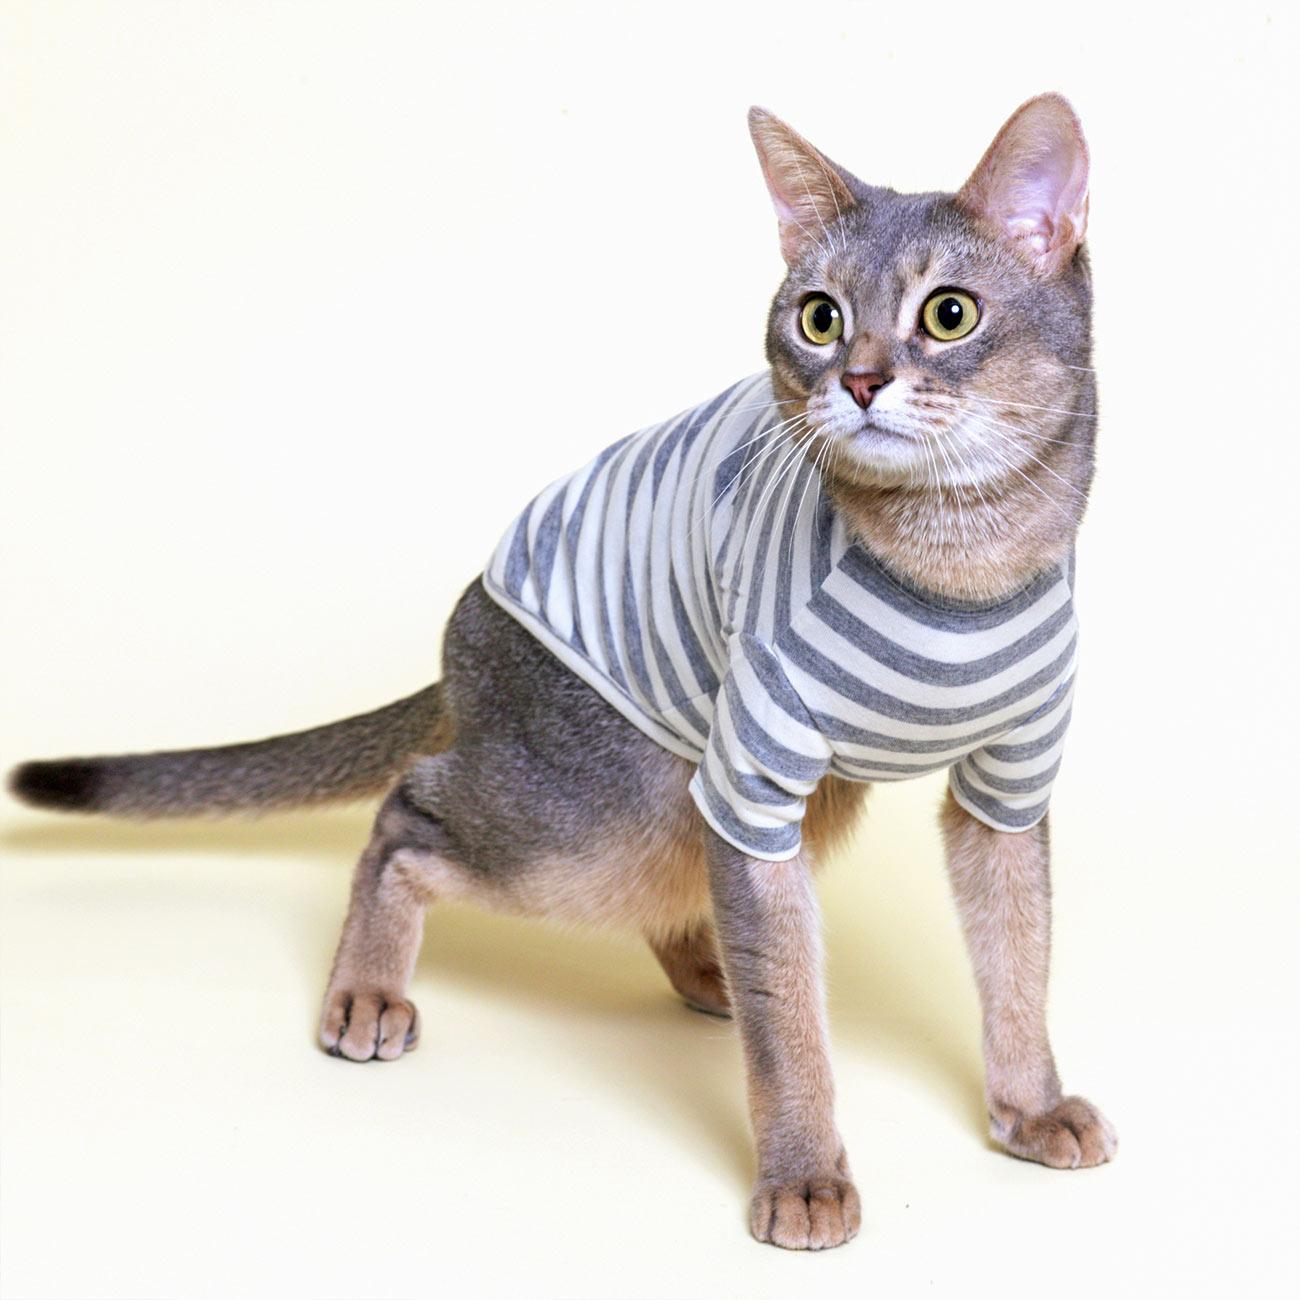 L.W.D. 猫の暮らし オーガニックネコTシャツ 【猫服 舐め防止 防寒 綿100%】